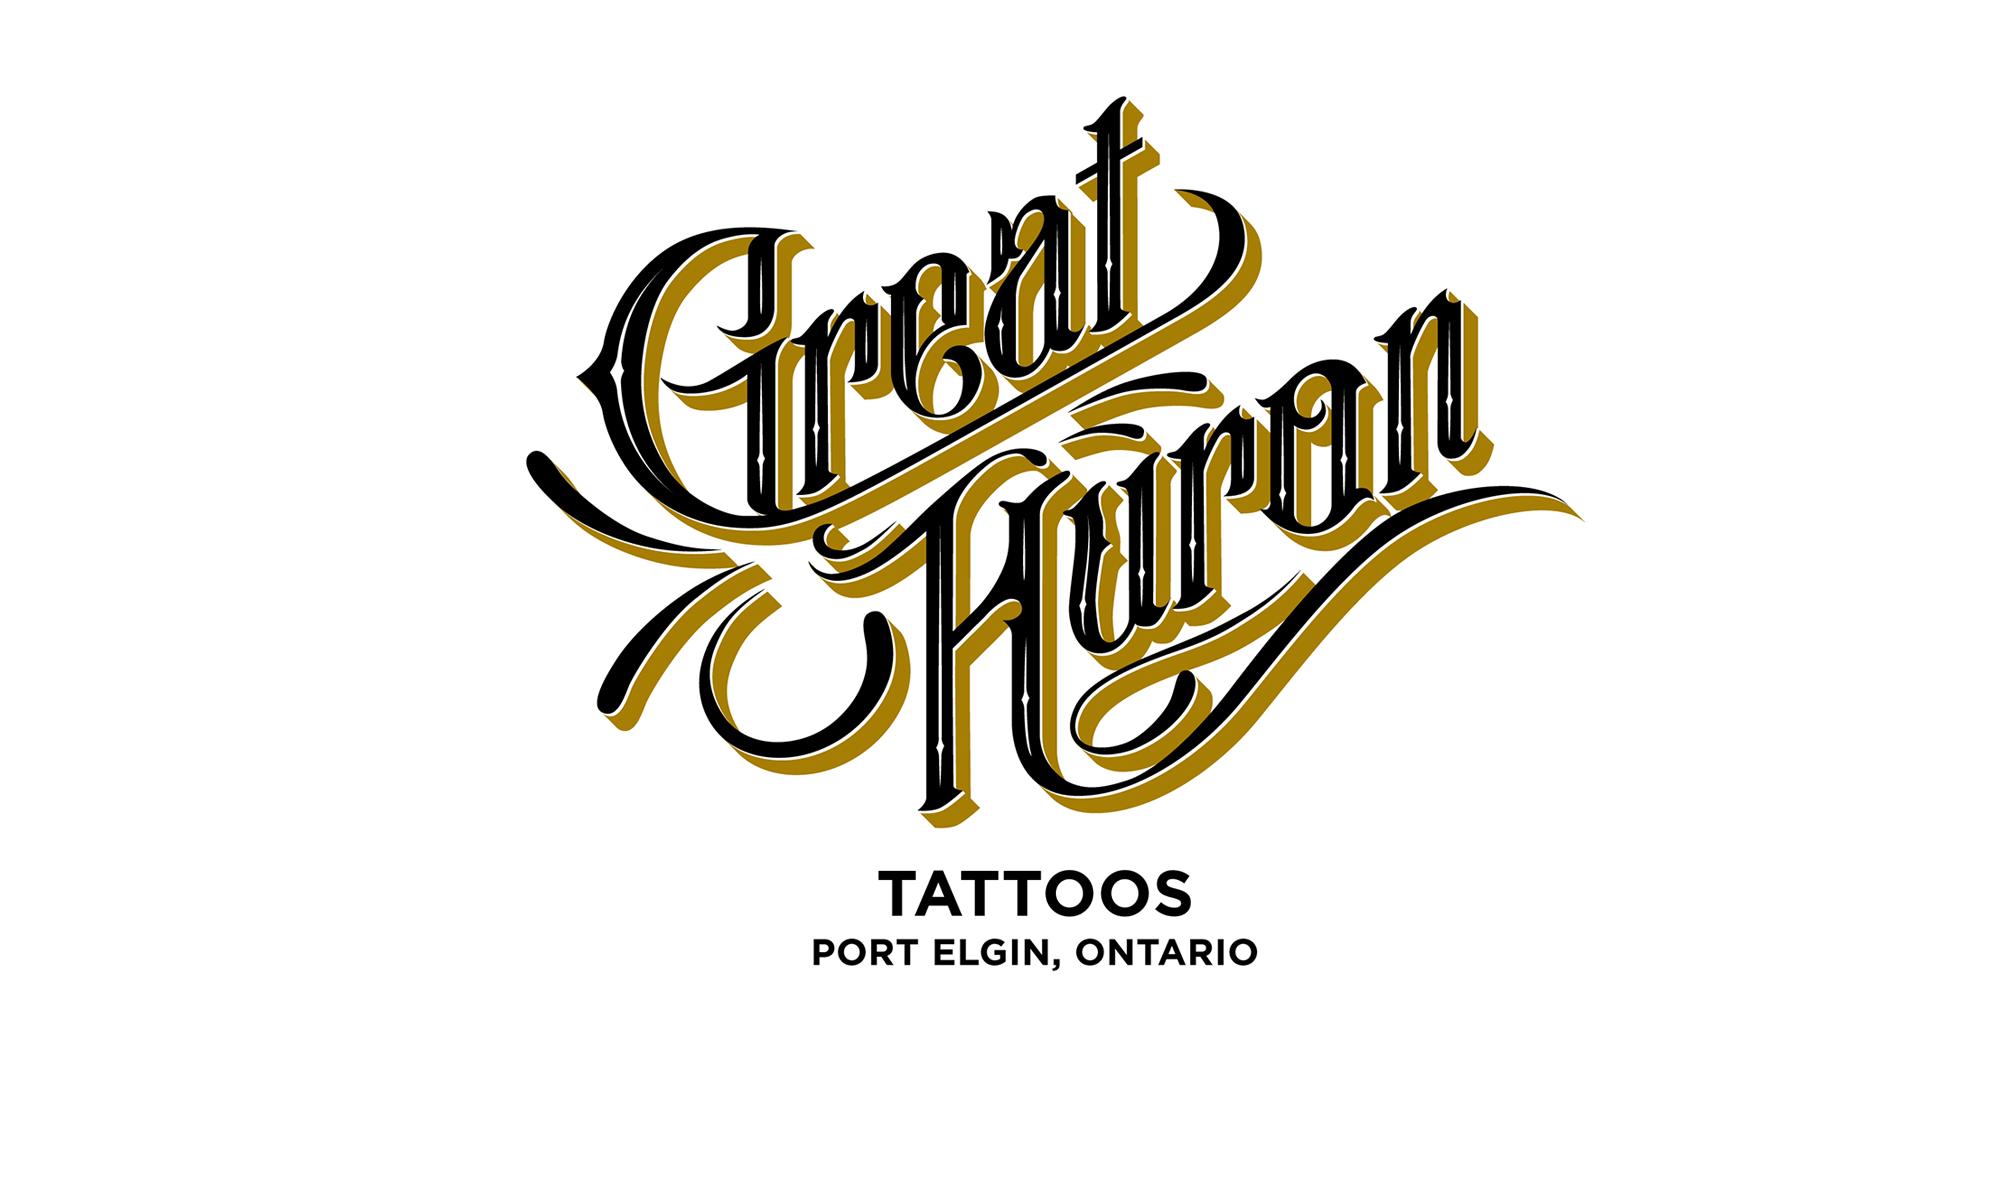 Great Huron Tattoos – Port Elgin, Ontario